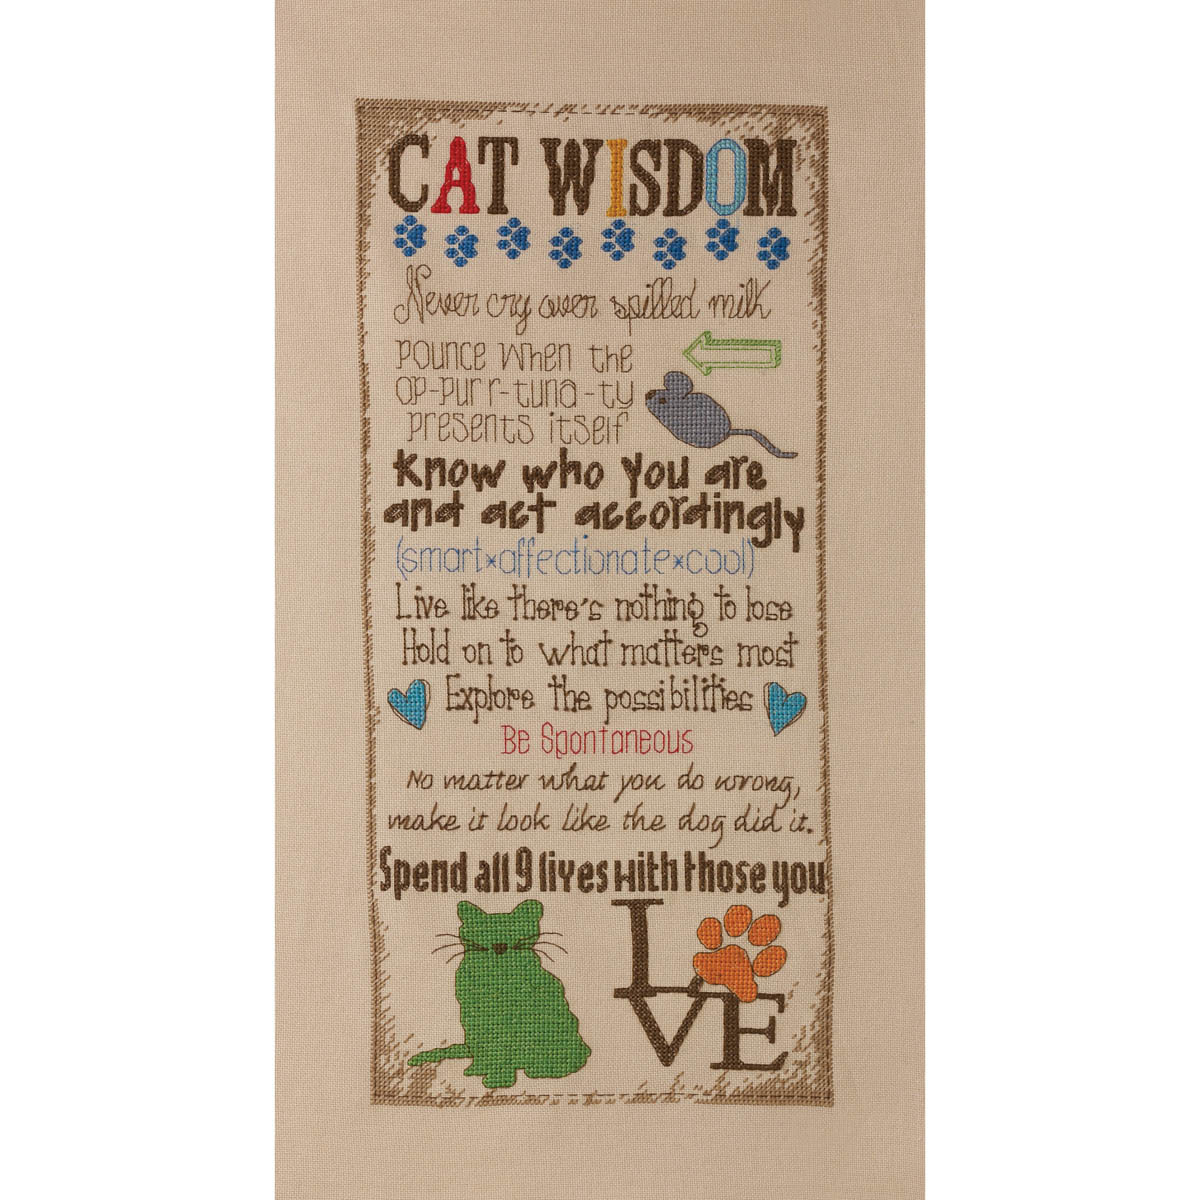 Bucilla ® Counted Cross Stitch - Picture Kits - Cat Wisdom